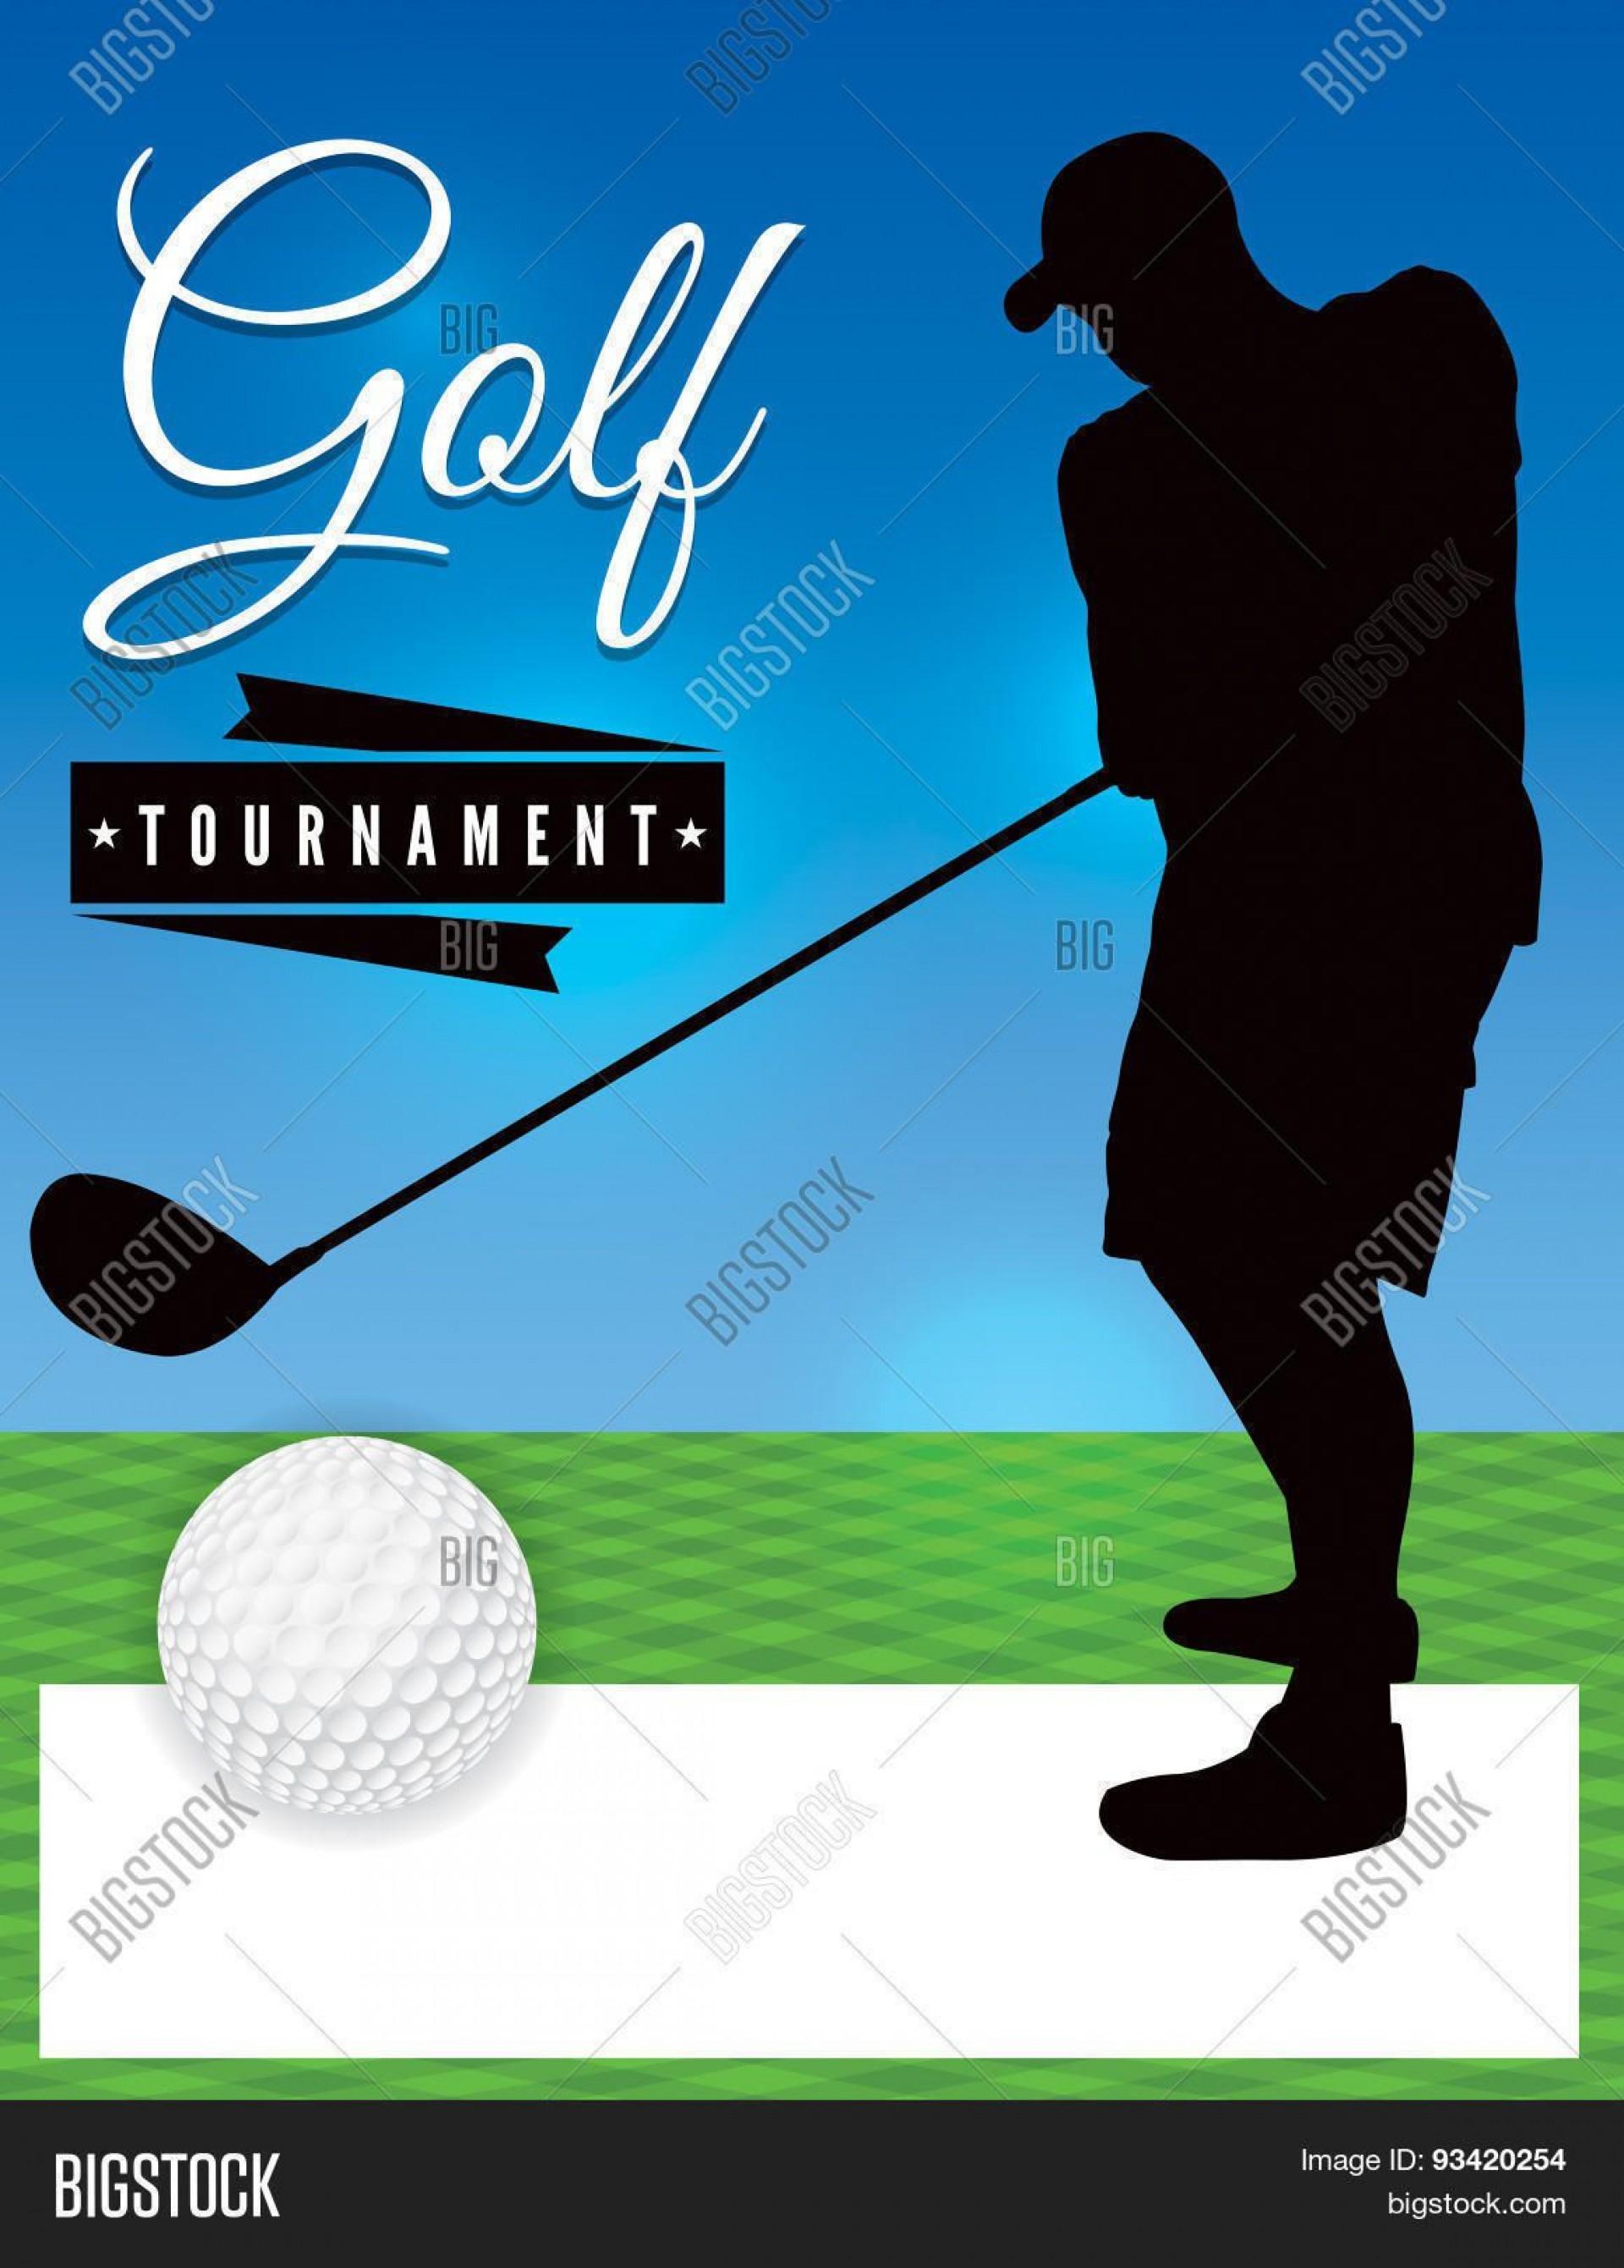 003 Stupendou Free Charity Golf Tournament Flyer Template Design 1920